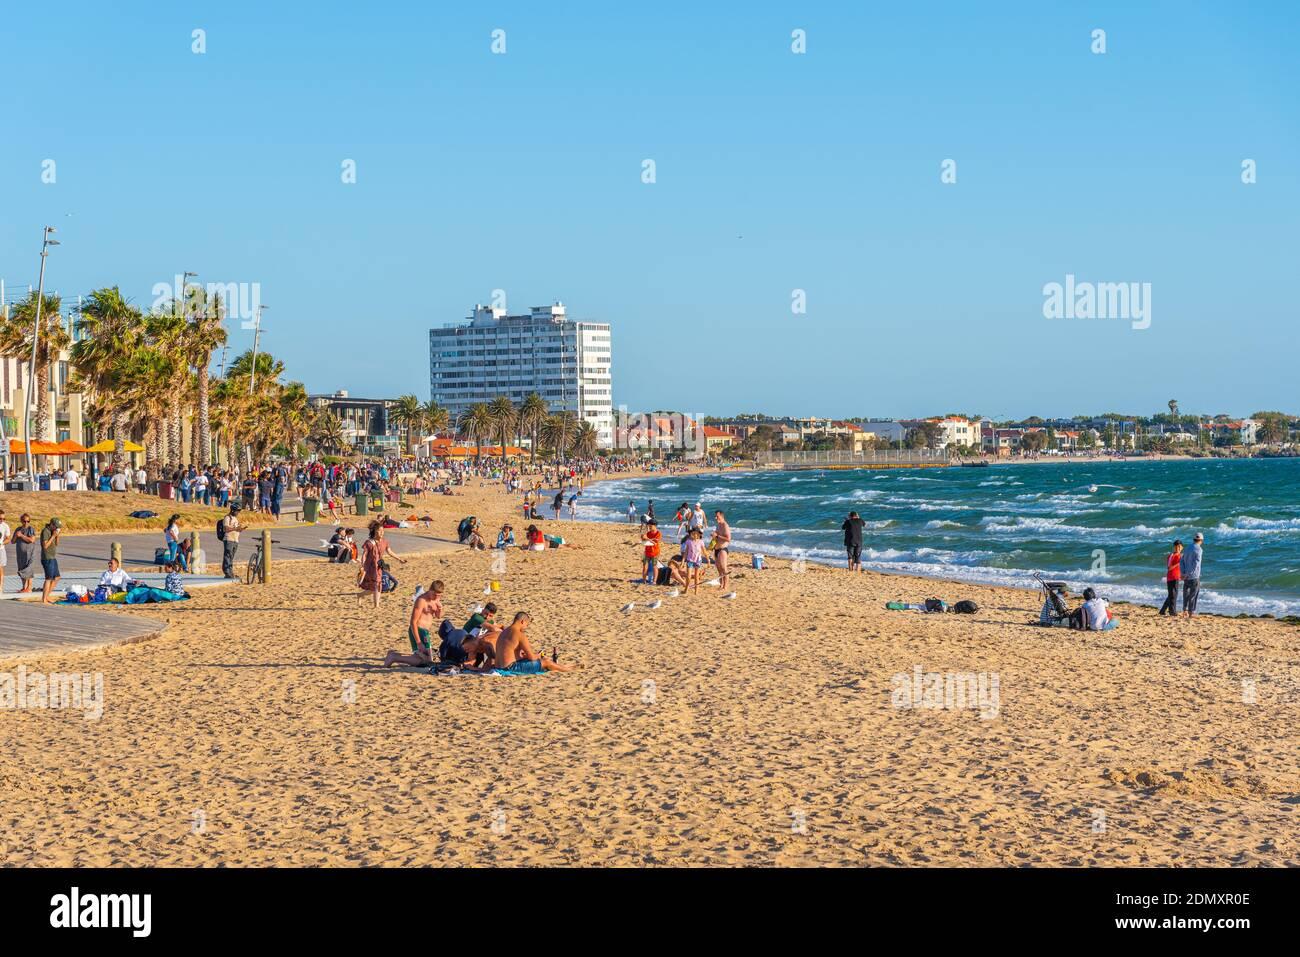 MELBOURNE, AUSTRALIA, JANUARY 1, 2020: People are enjoying a sunny day on a beach at St. Kilda, Australia Stock Photo